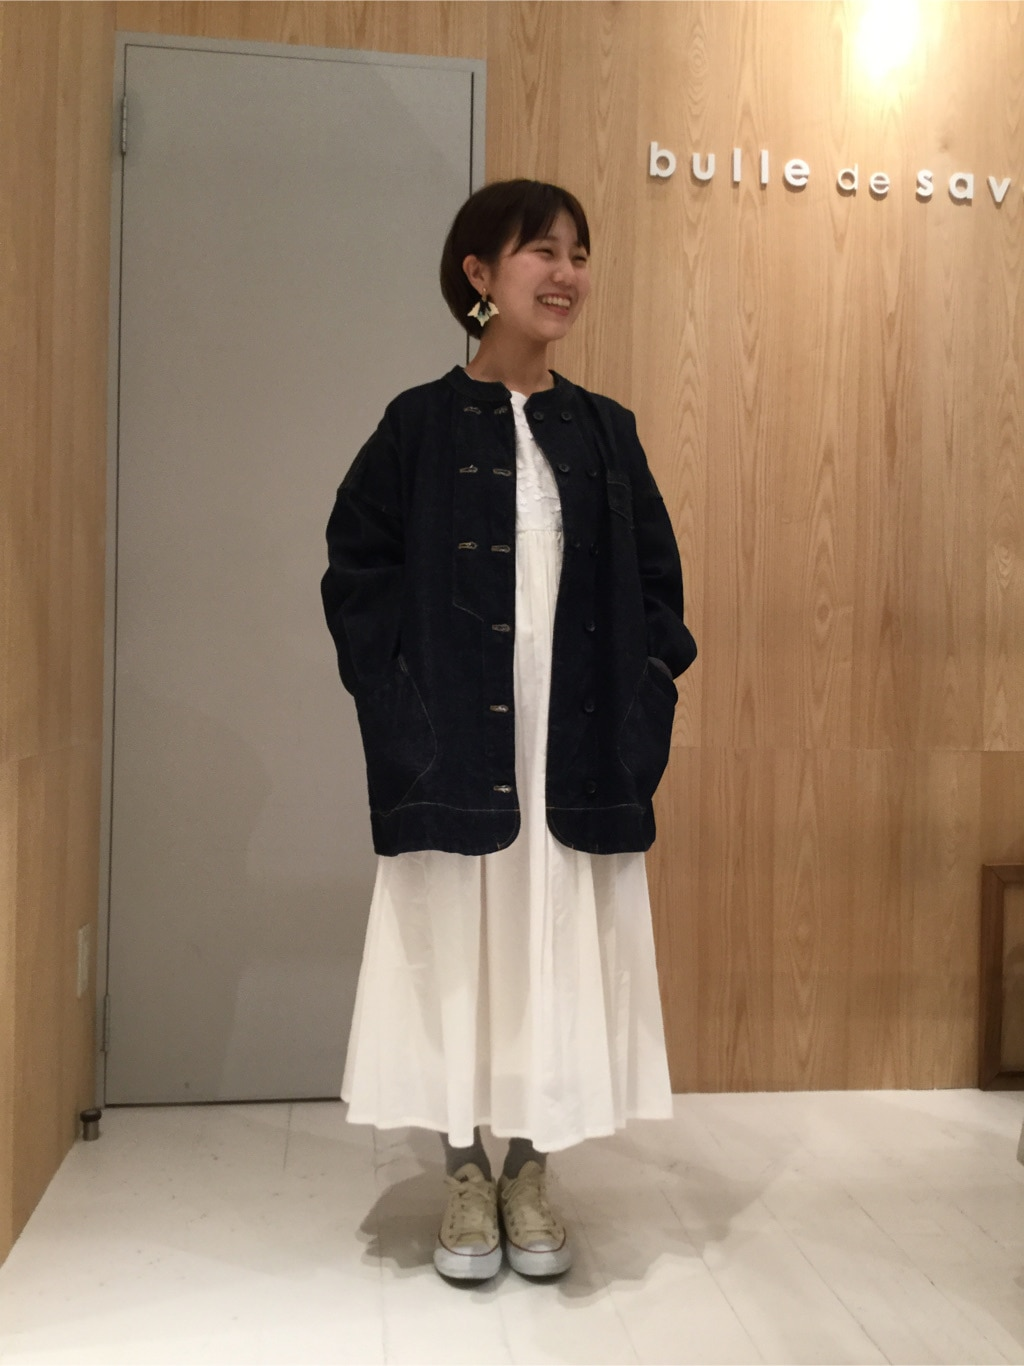 bulle de savon なんばシティ 身長:149cm 2020.02.26